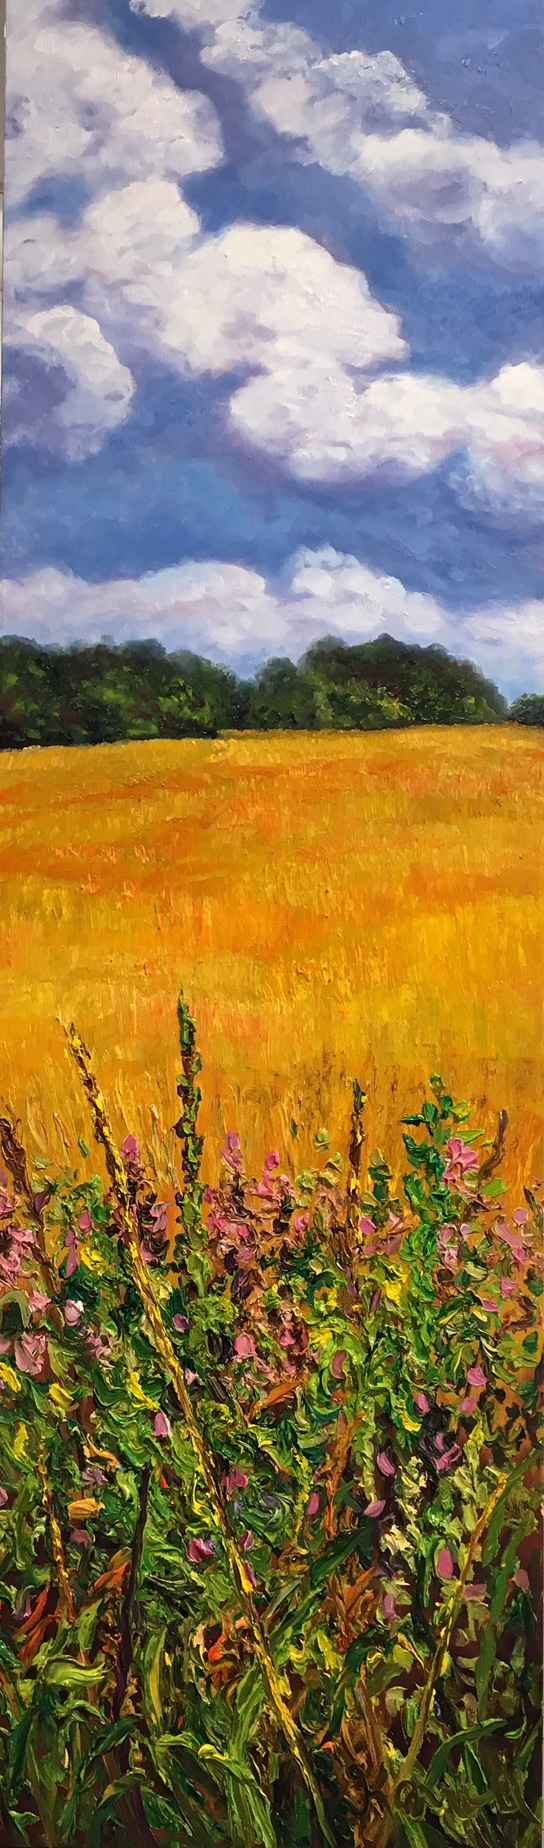 Summer Delight by Ms Debra Lynn Carroll - Masterpiece Online